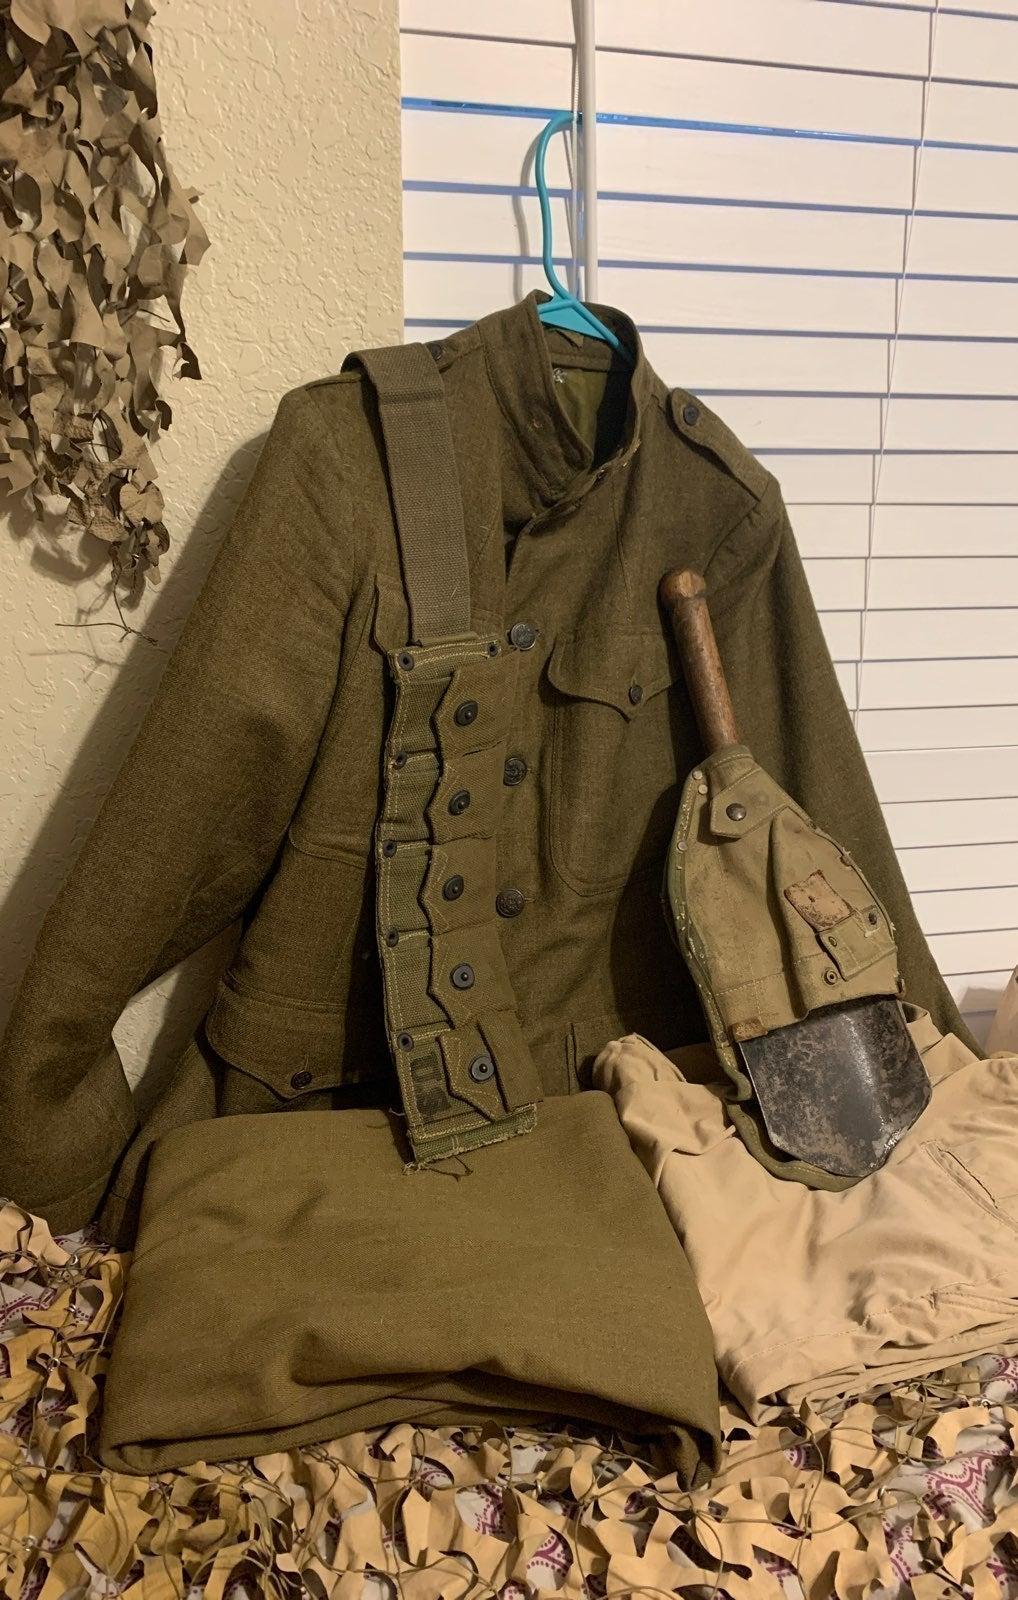 Vintage Army Uniform &Gear(NO TROUSERS)